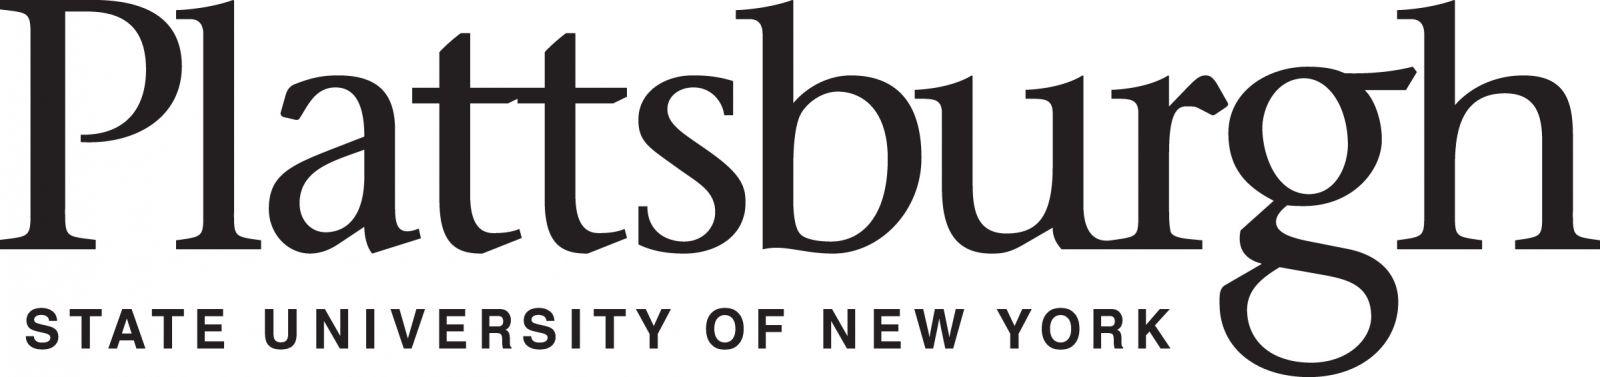 State University Of New York College at Plattsburgh